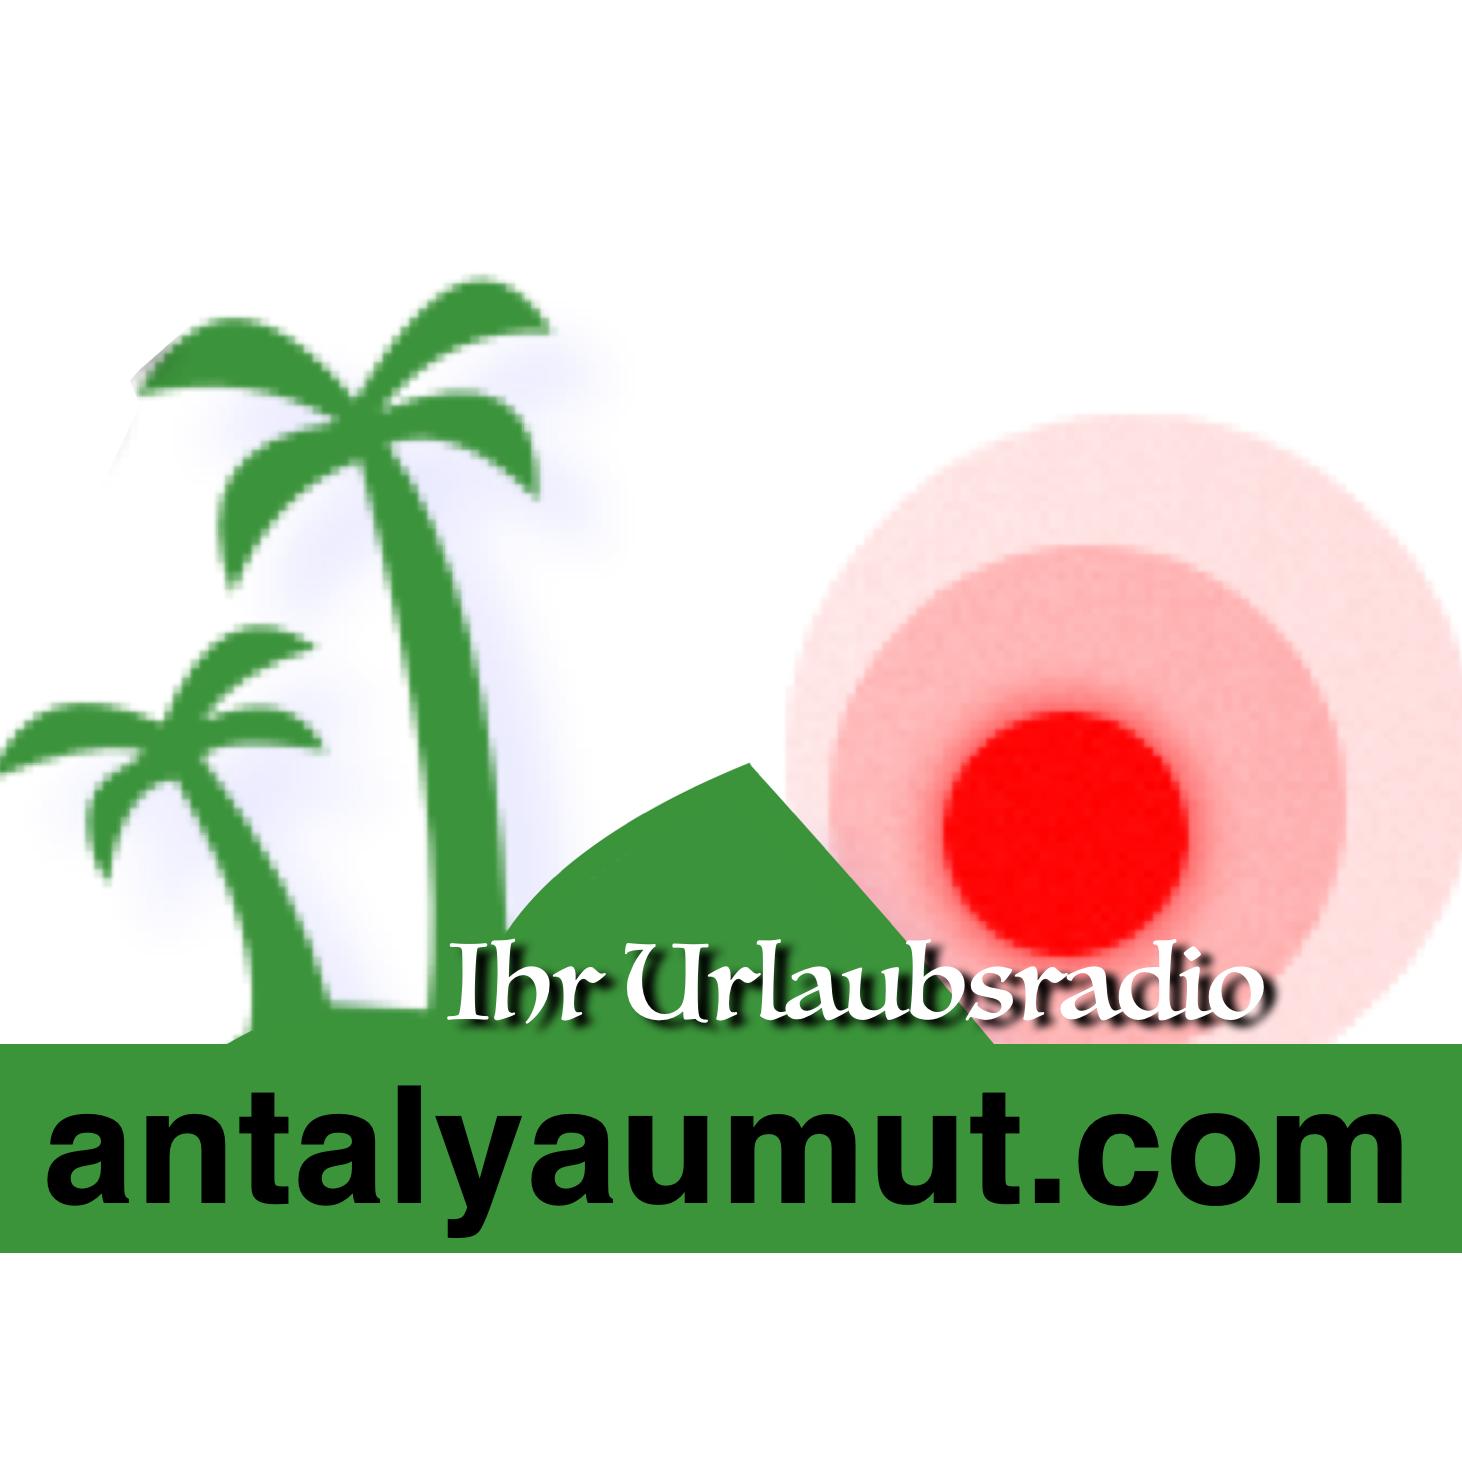 Urlaubsradio